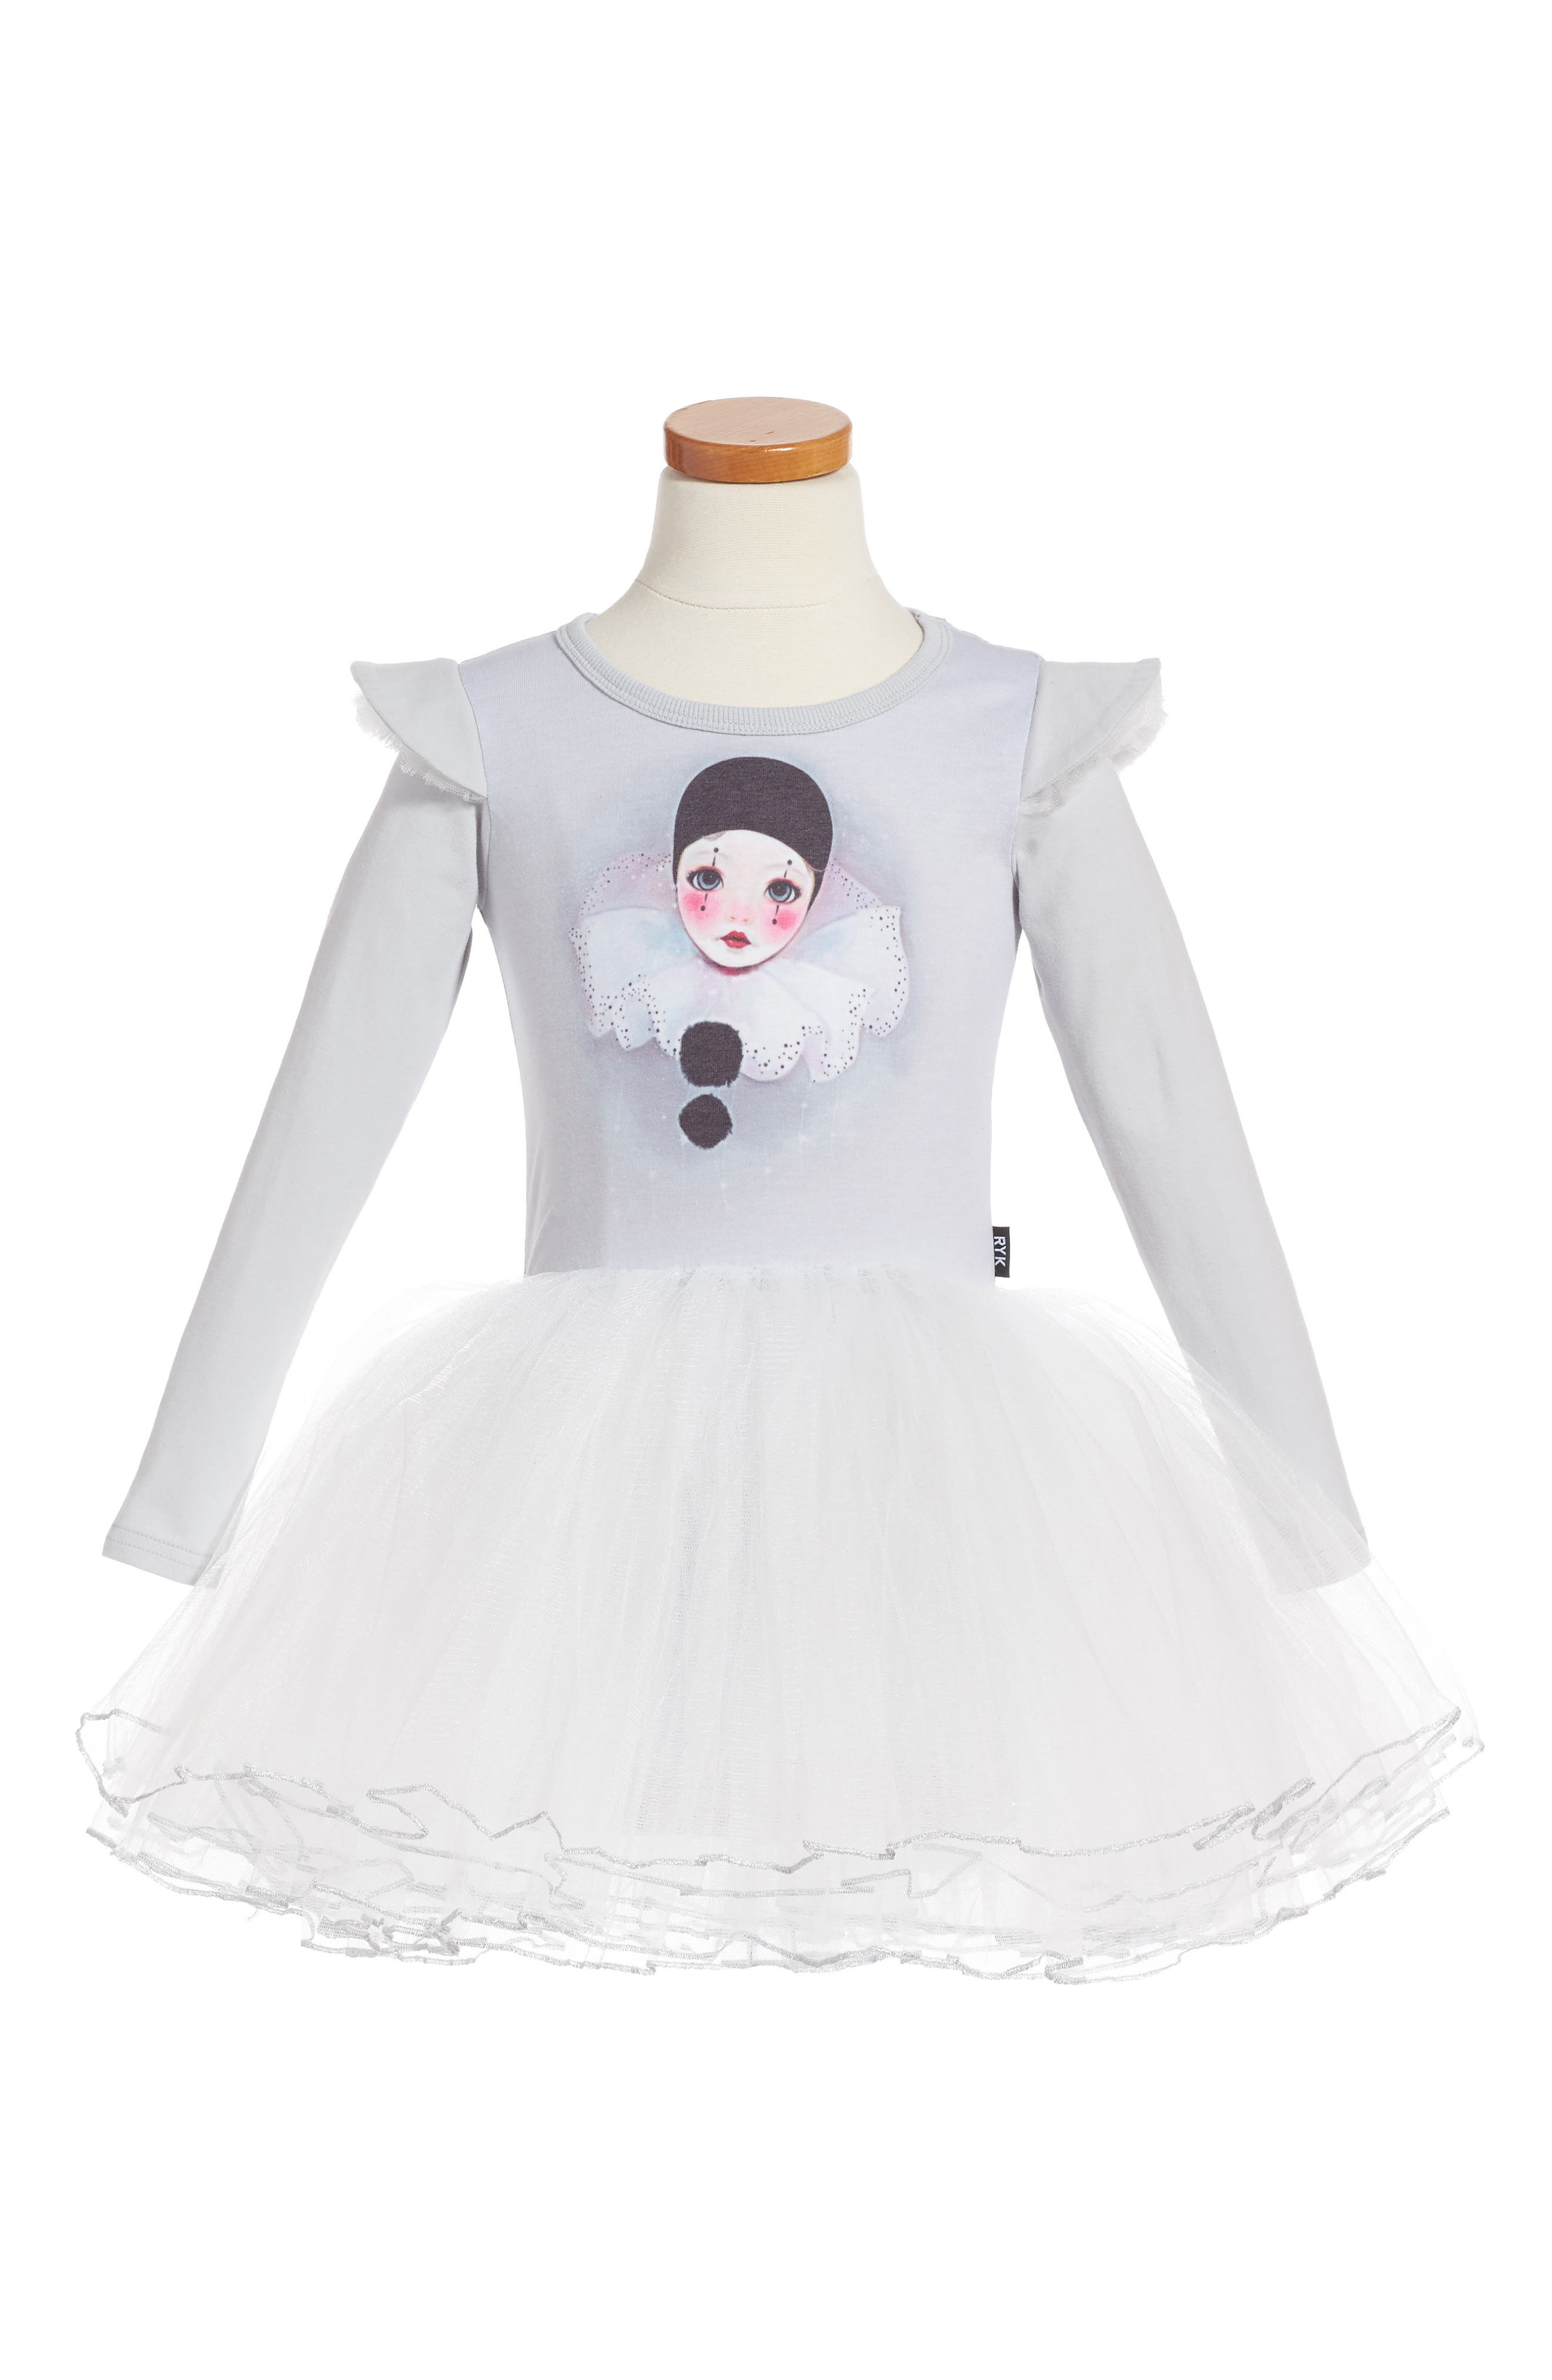 Pierrot Circus Dress,                             Main thumbnail 1, color,                             040